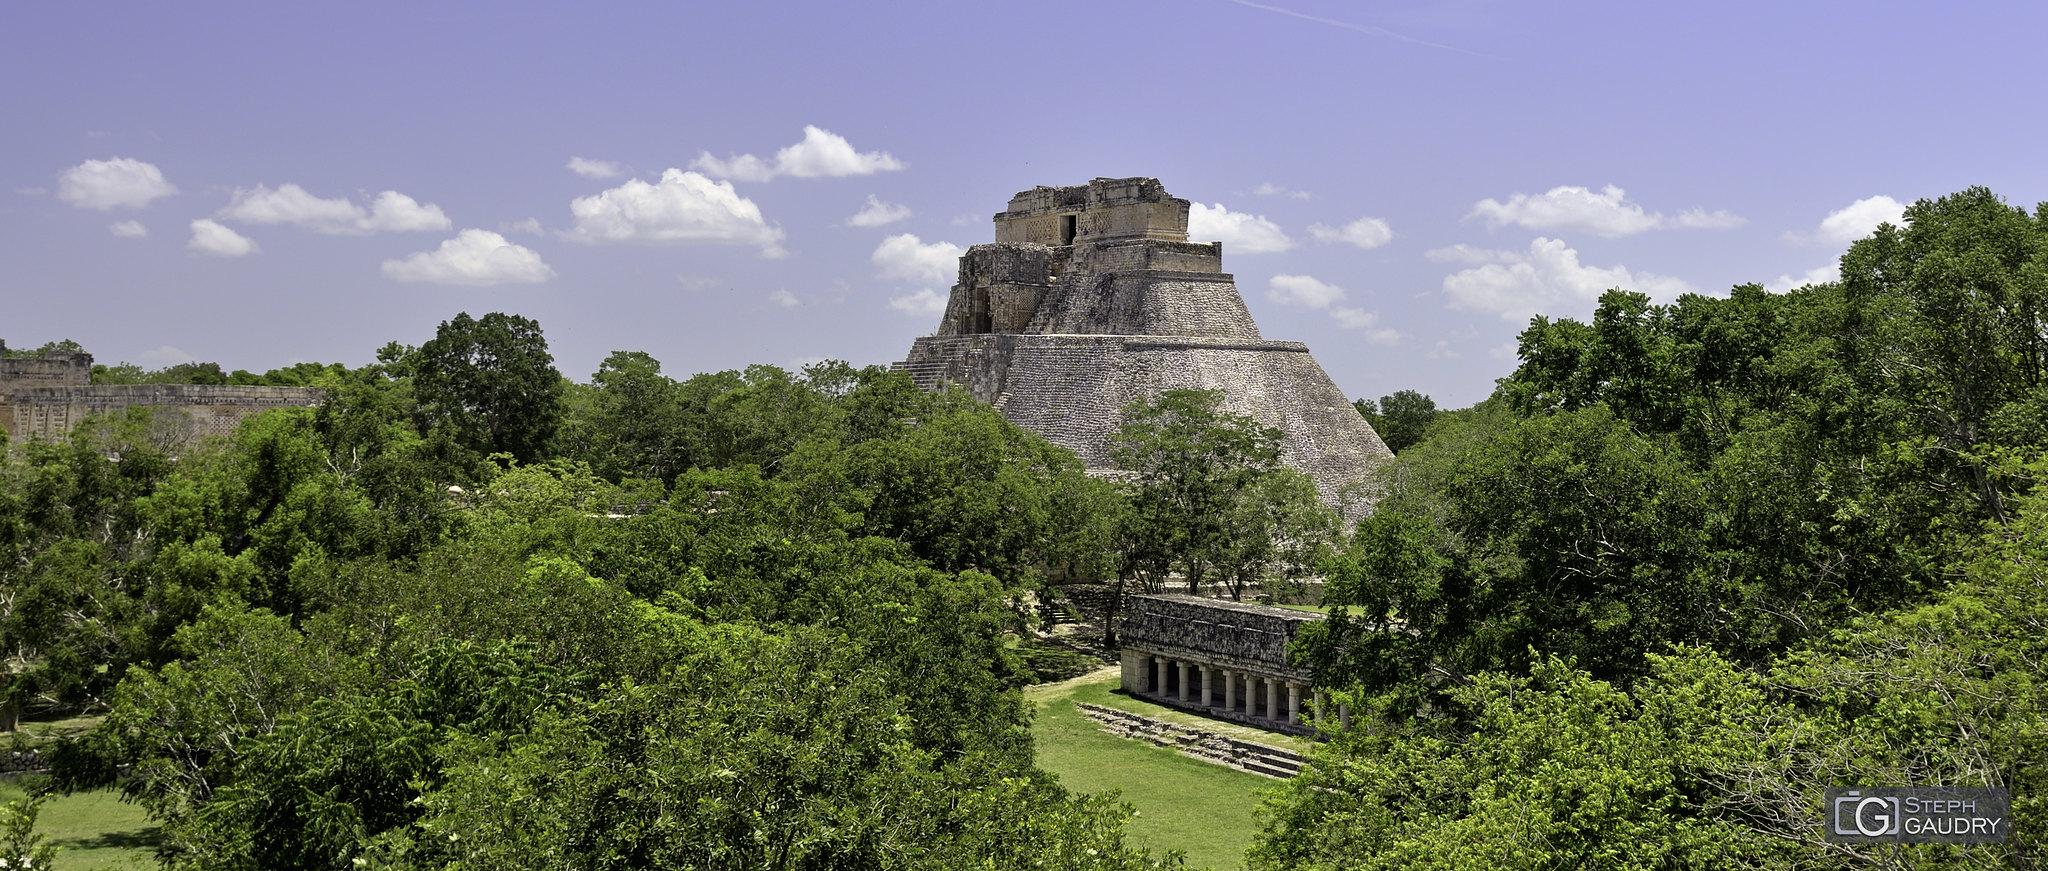 La pyramide du Devin à Uxmal [Click to start slideshow]